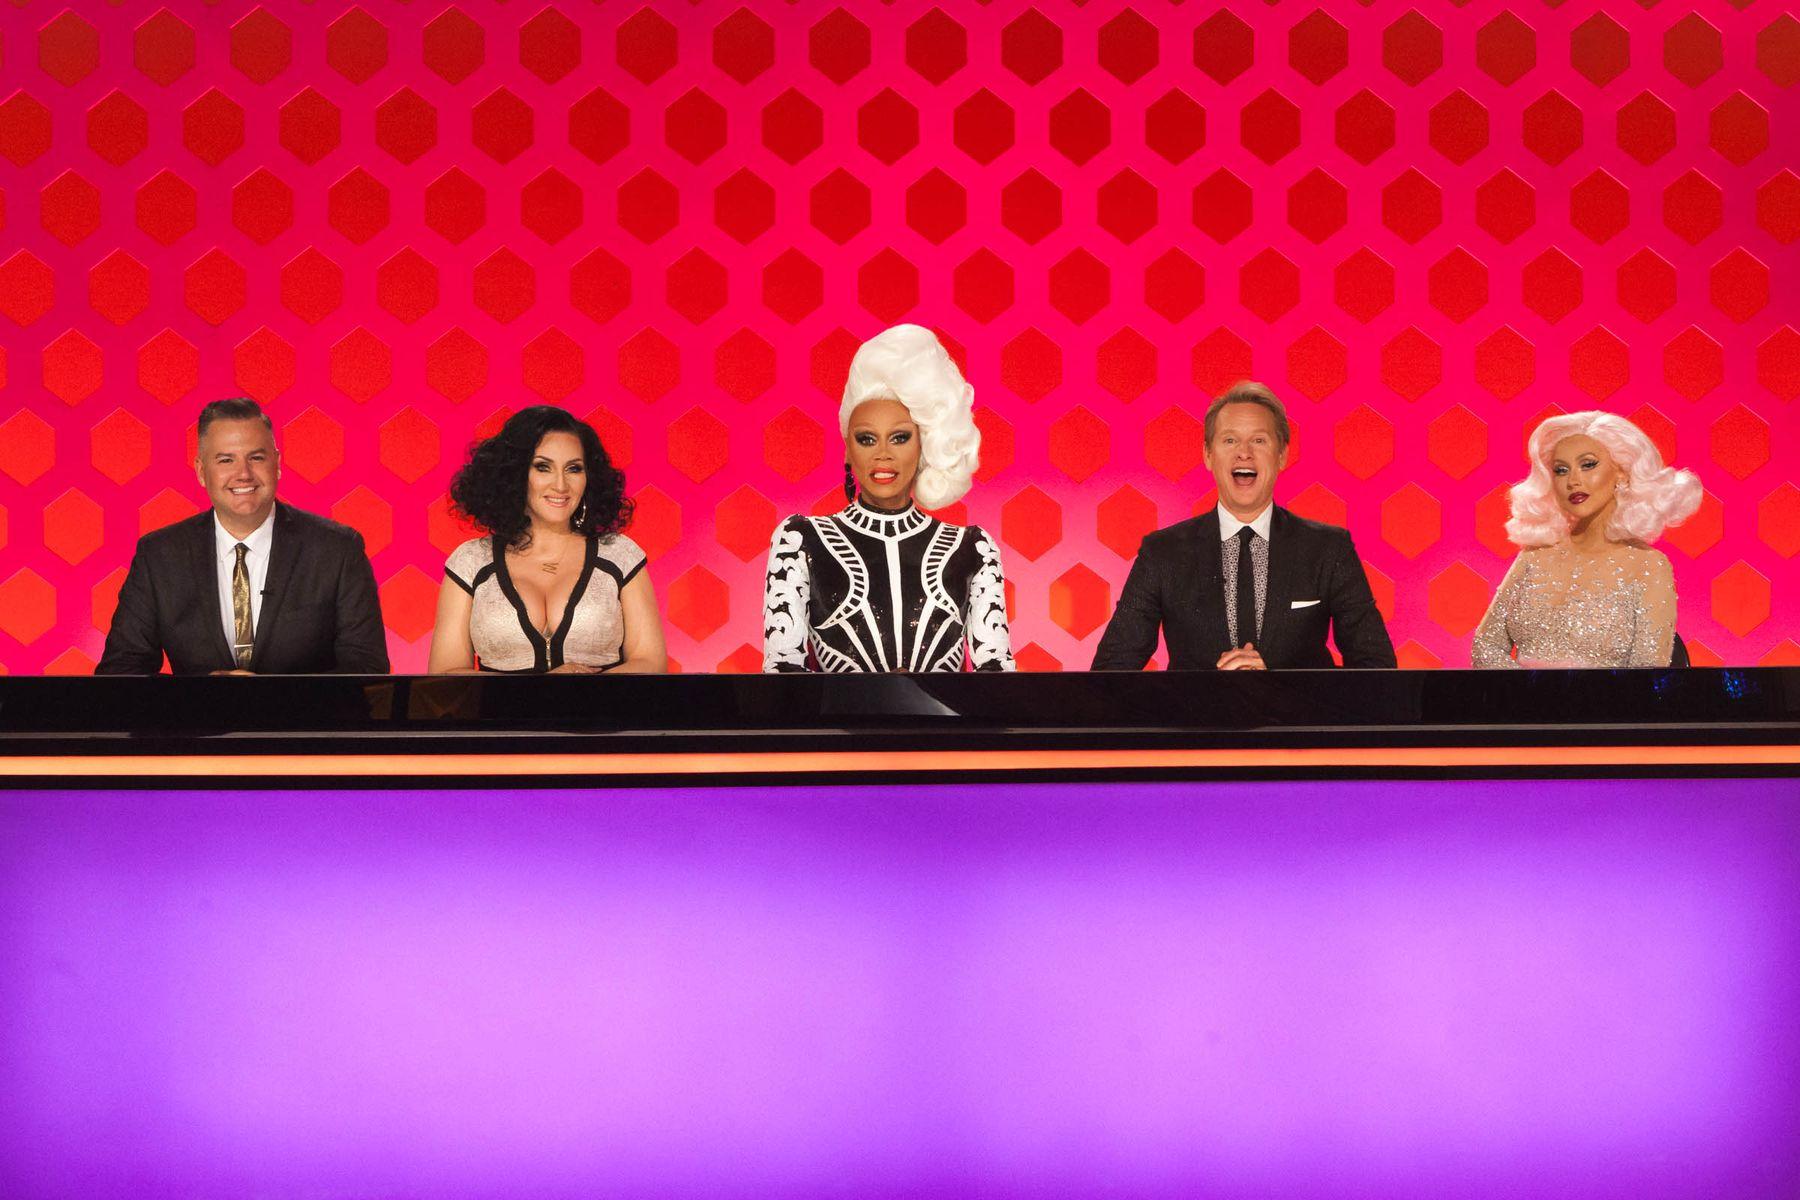 Why Is Drag Race Seasons 2-7 No Longer On Netflix?